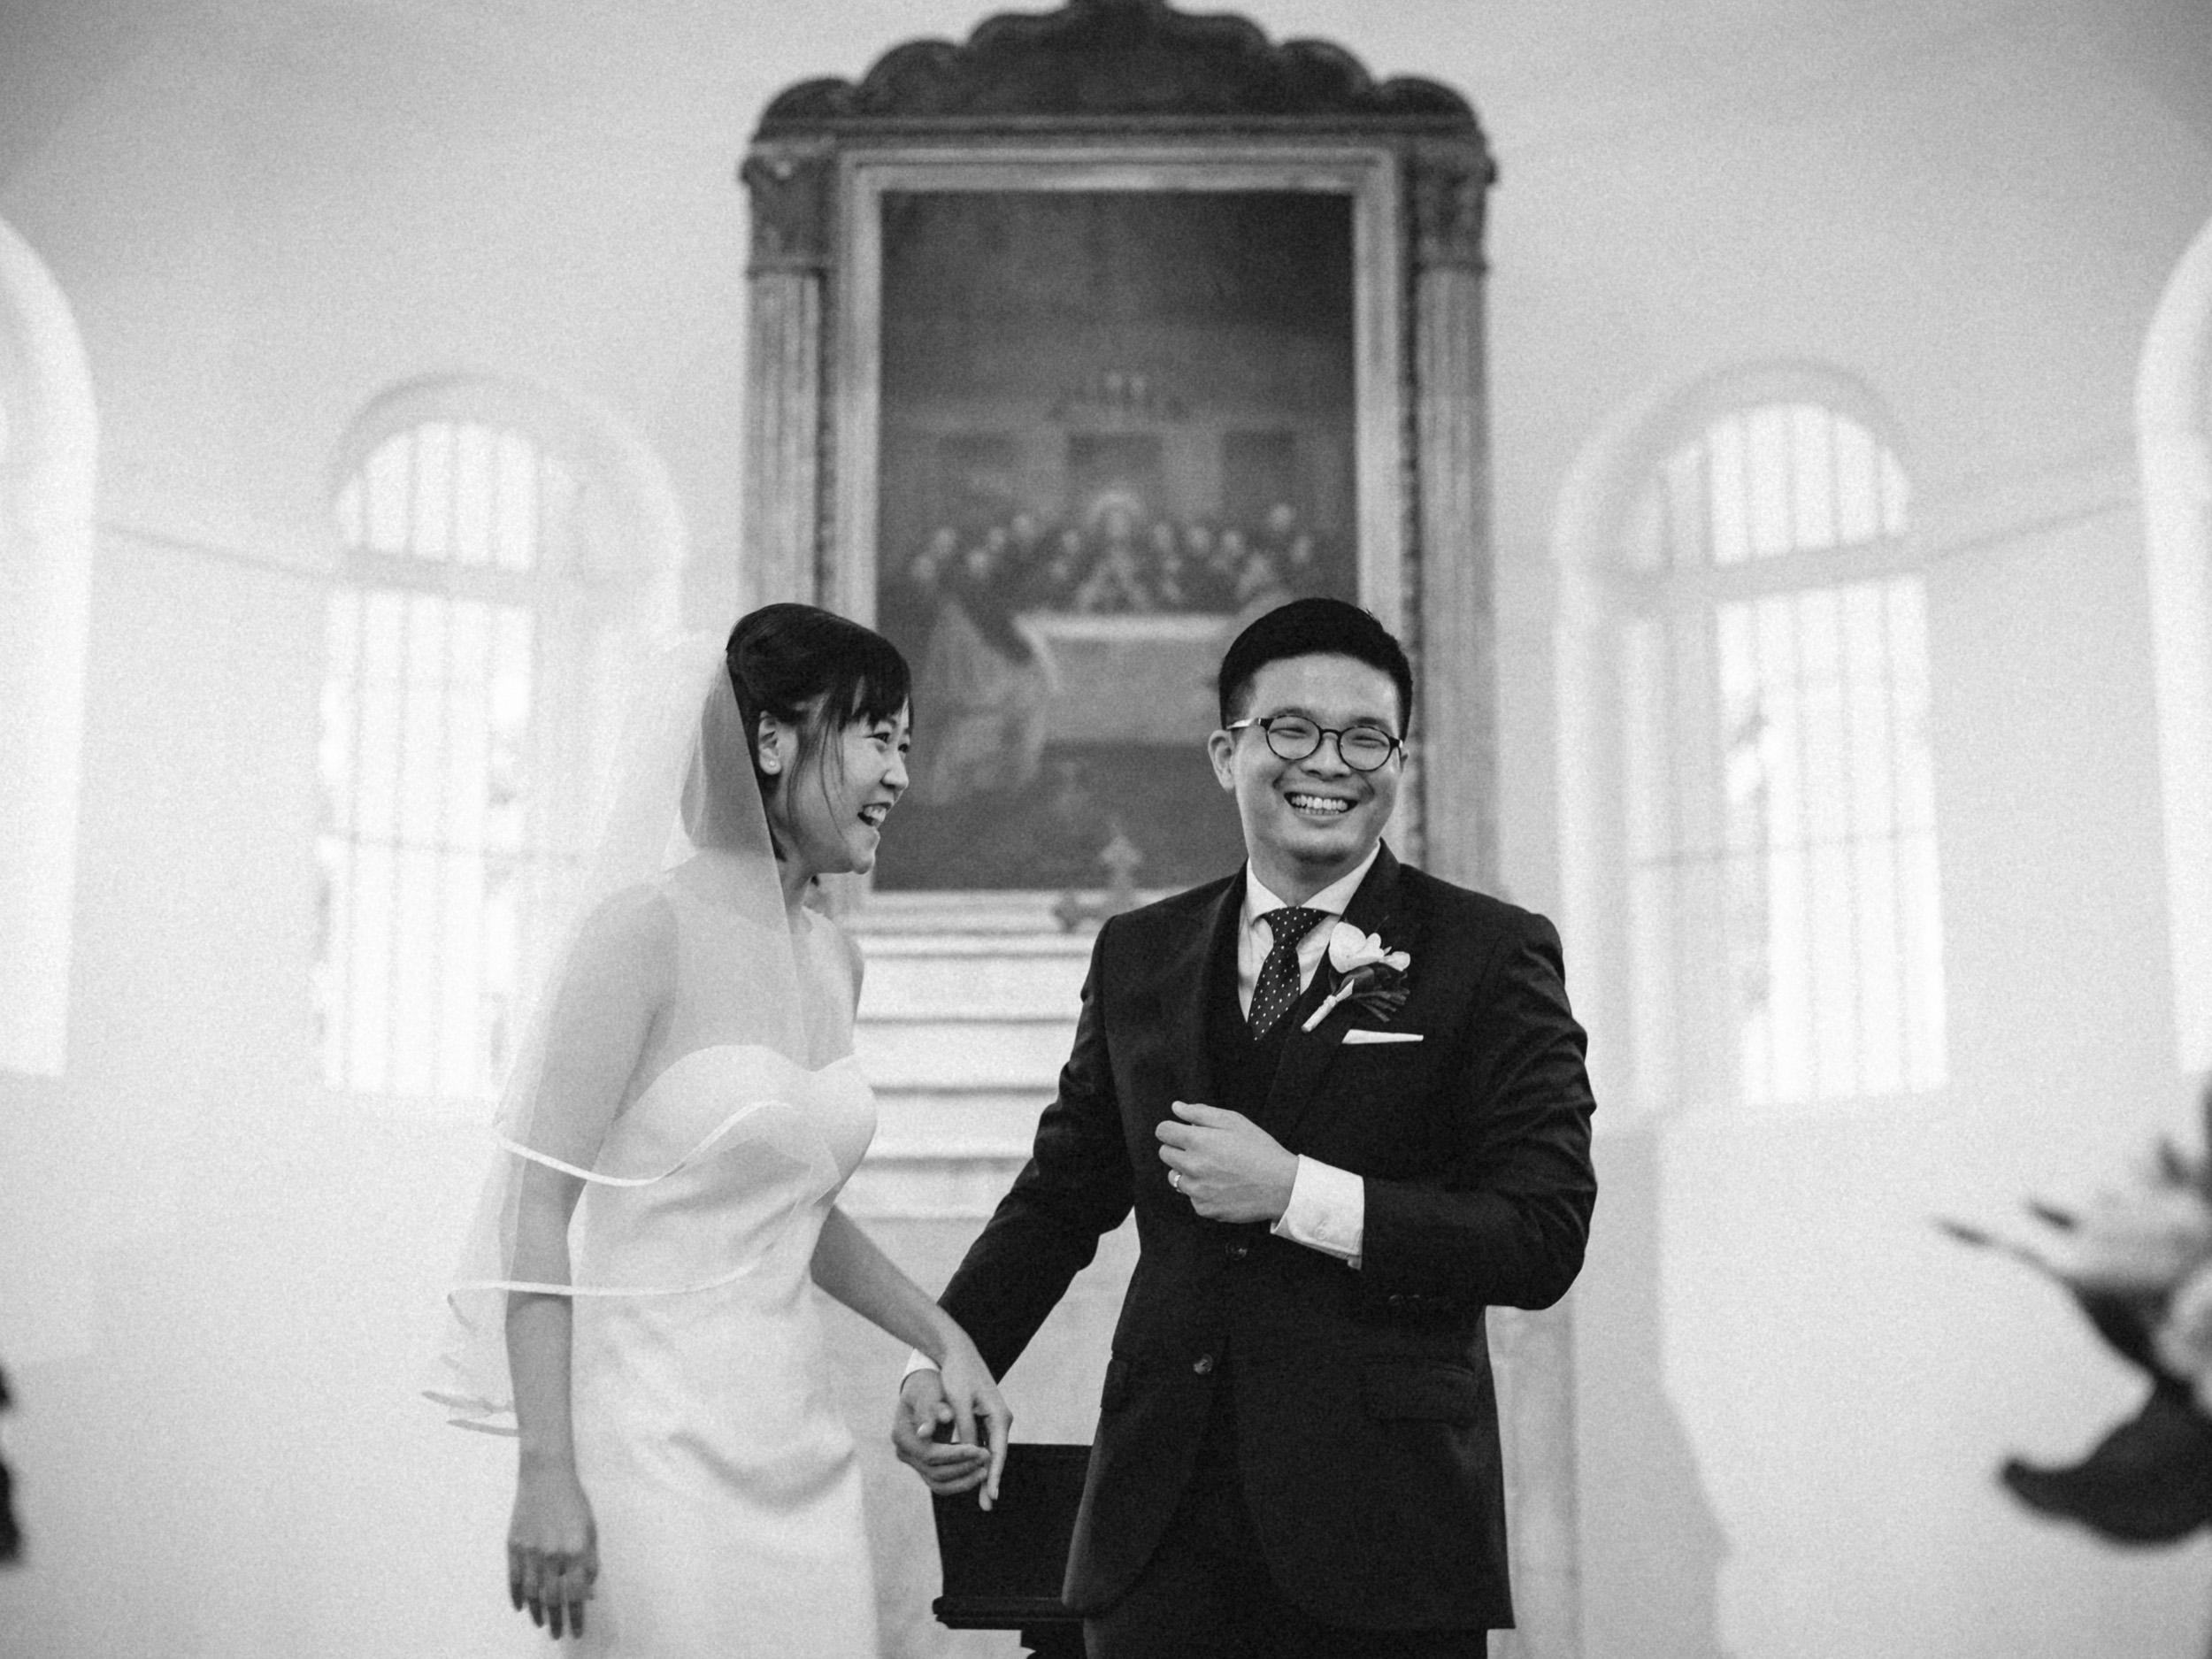 singapore-wedding-photographer-photography-wmt2017-051.jpg